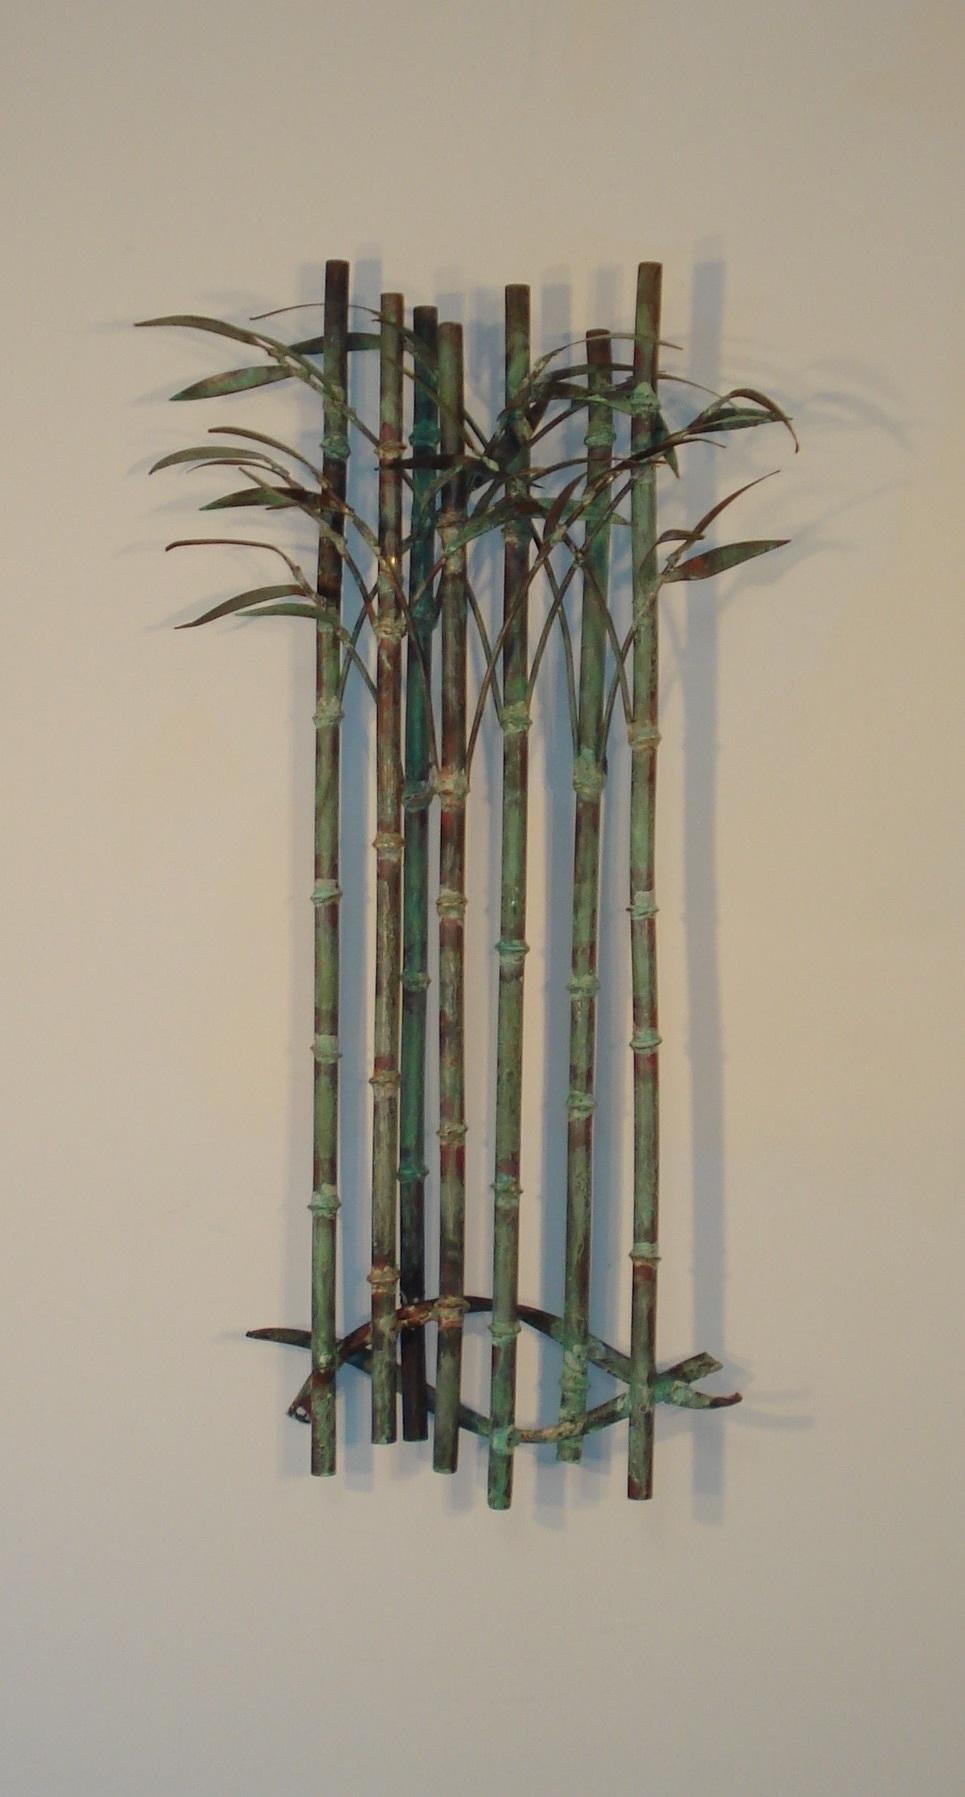 Bamboo Delight Metal Wall Art – Metal Wall Sculpture Decor – Gurtan Throughout Current Bamboo Wall Art (View 3 of 20)